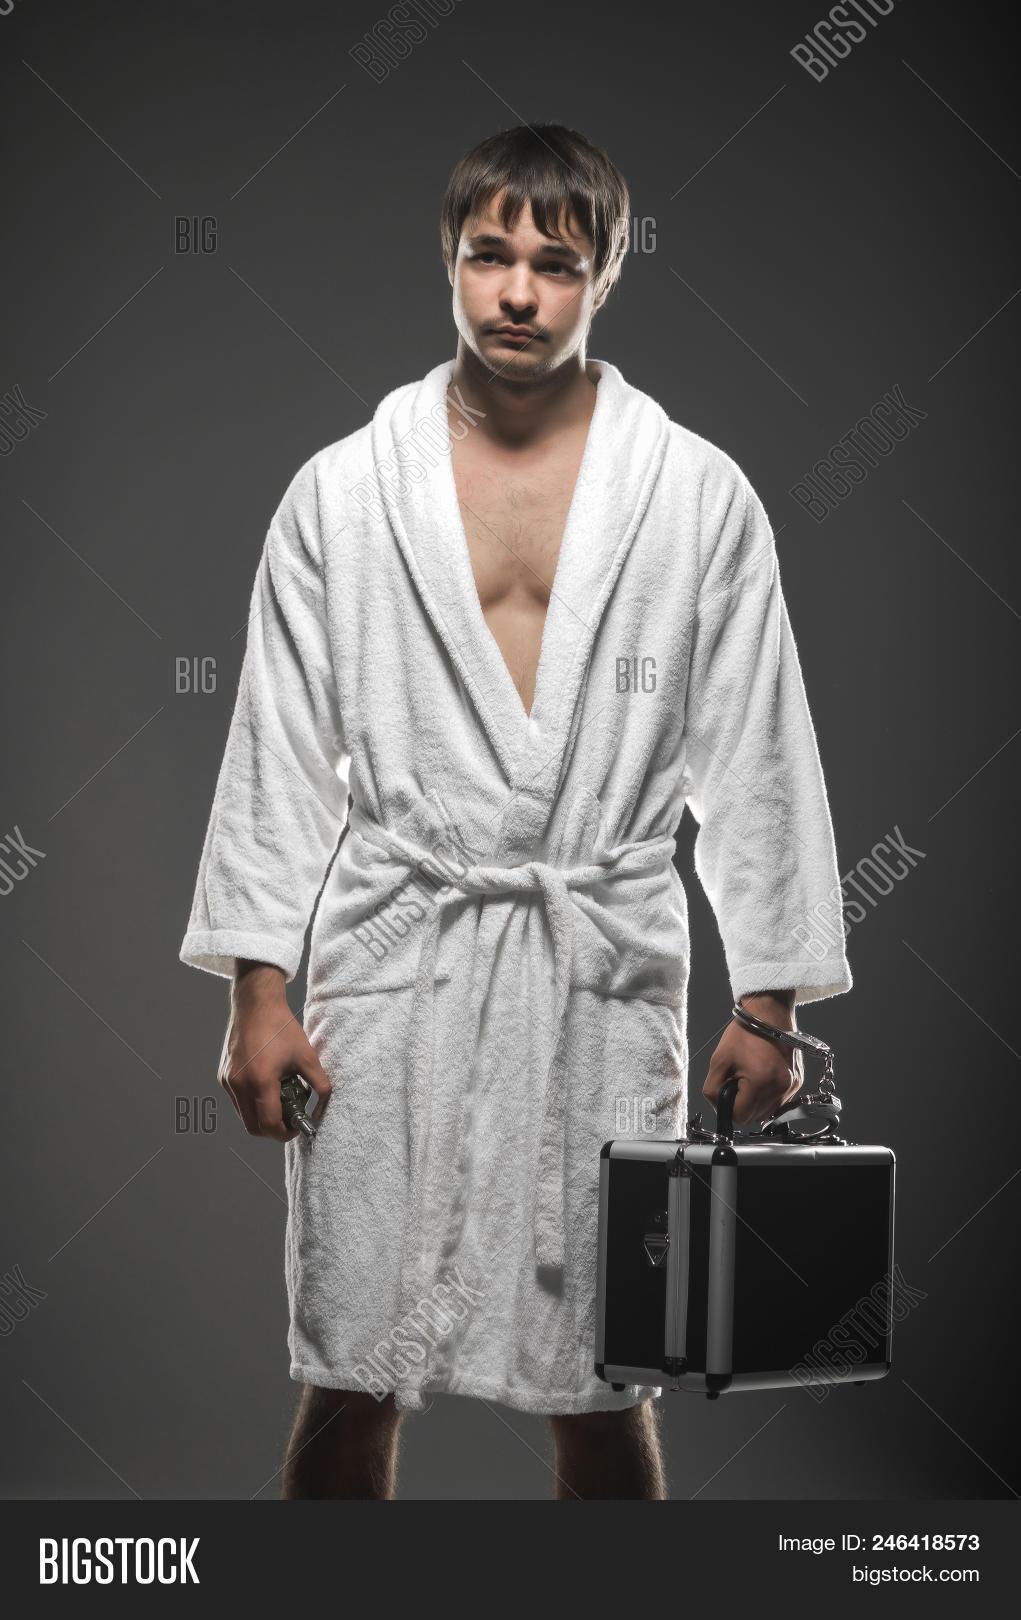 Man White Robe Holding Image Photo Free Trial Bigstock